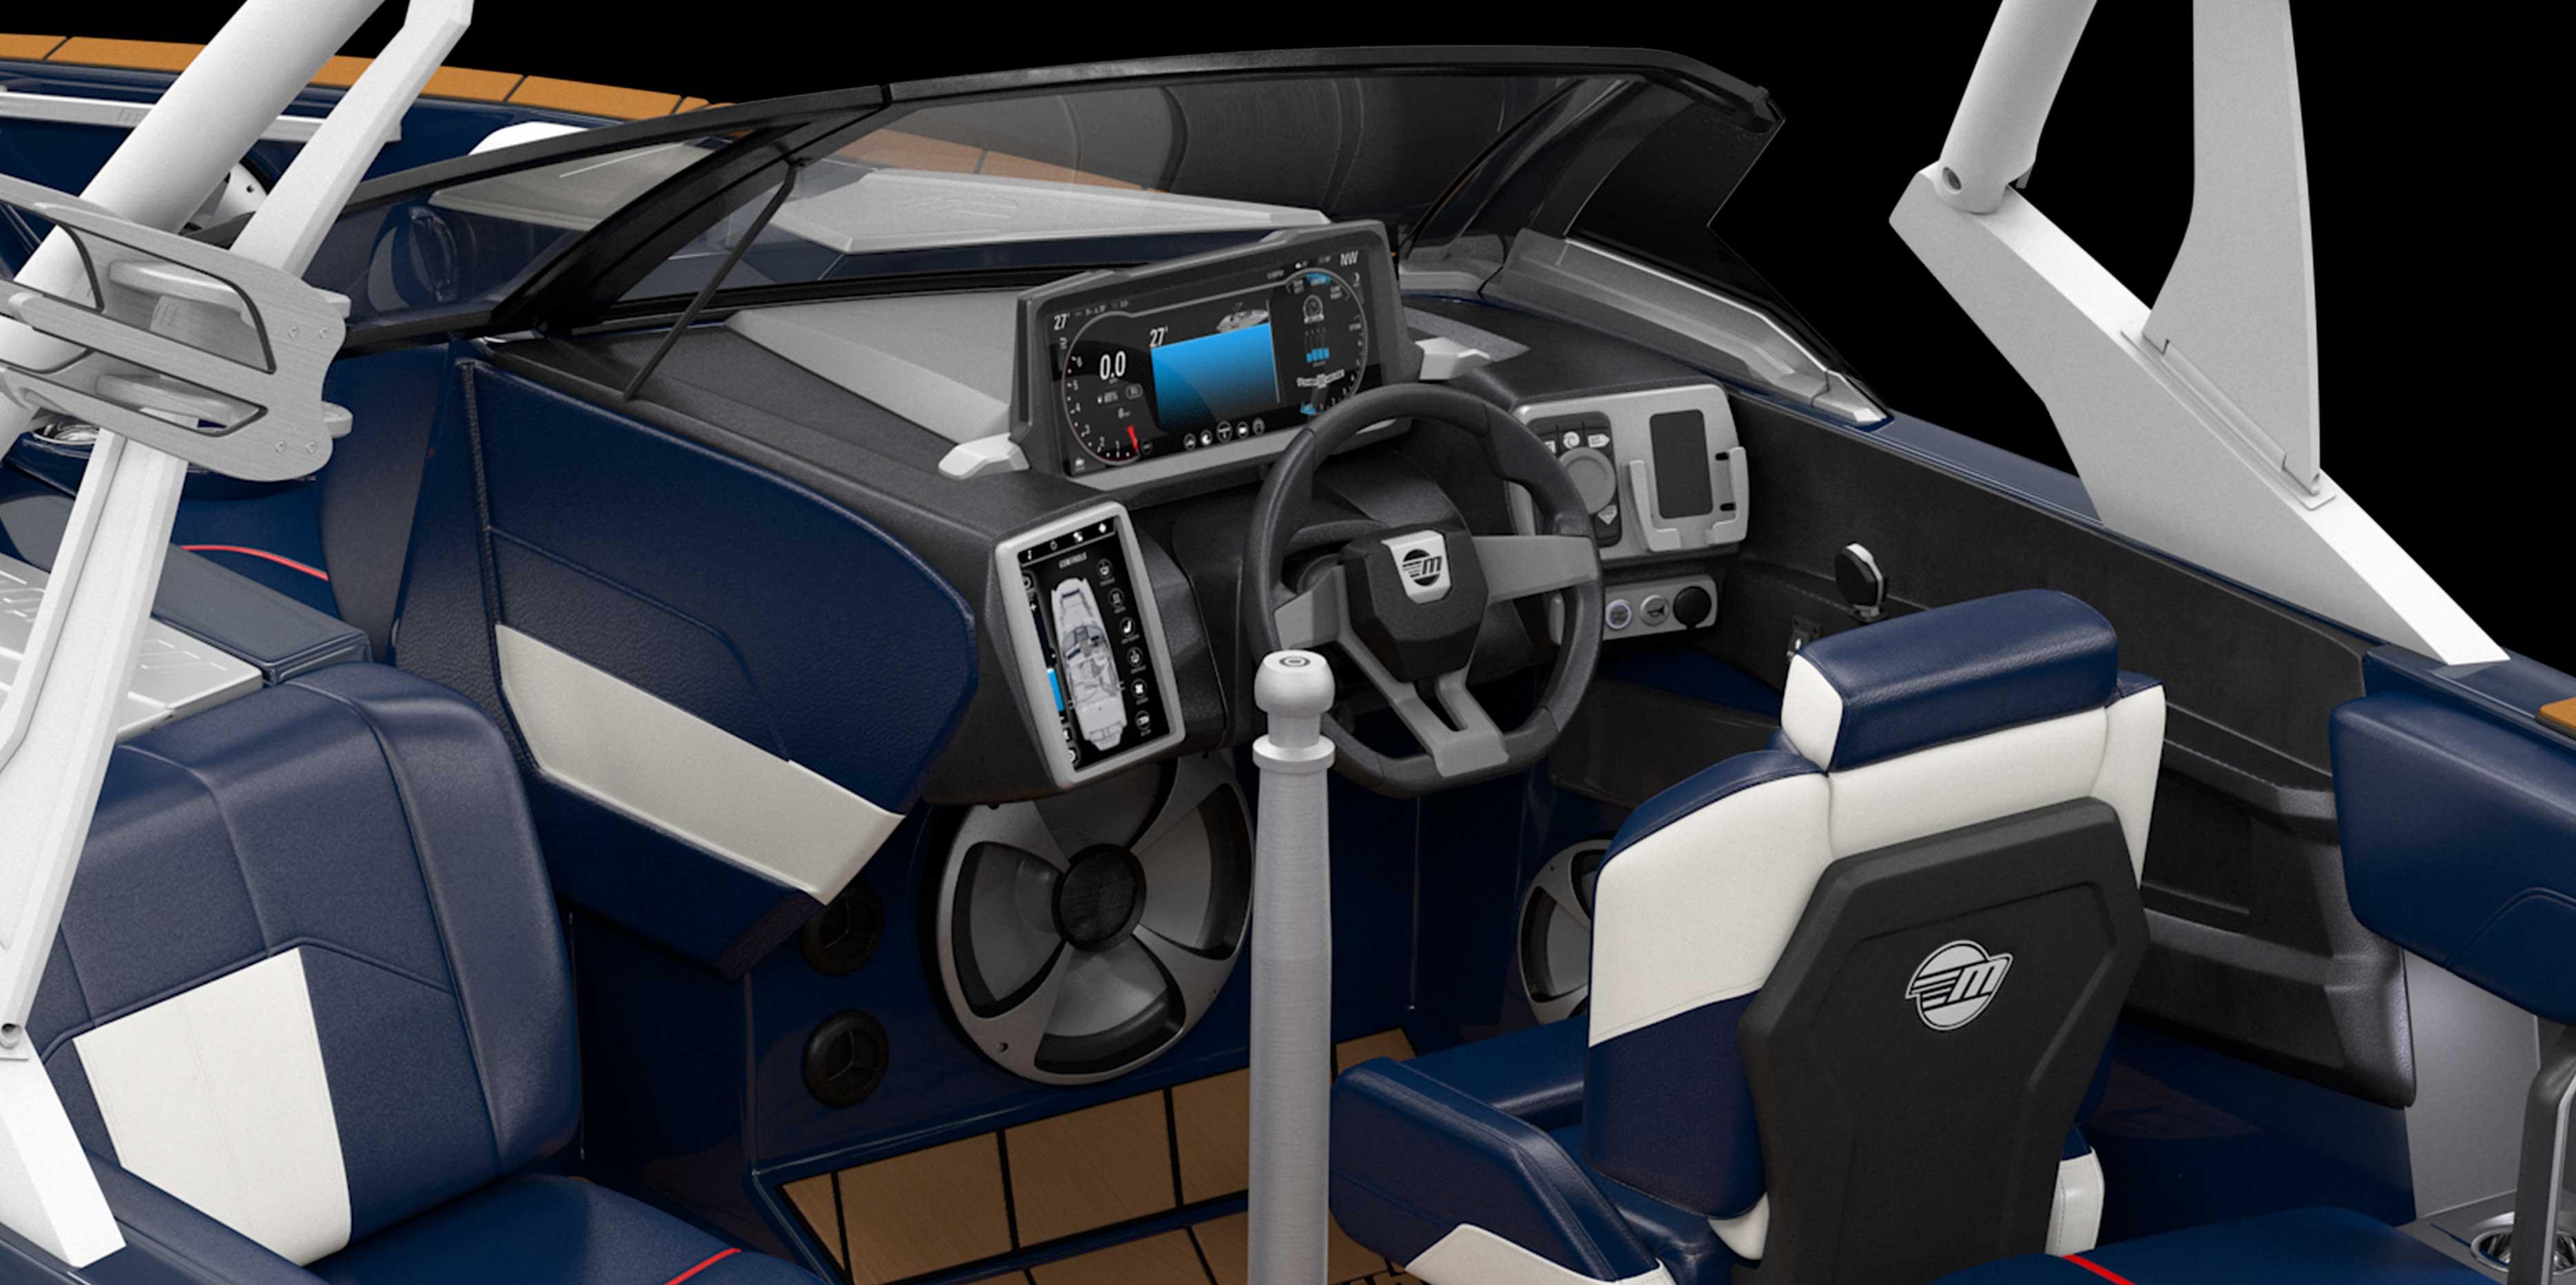 Malibu Boats 20 VTX, The Most Versatile Crossover Tow Boat